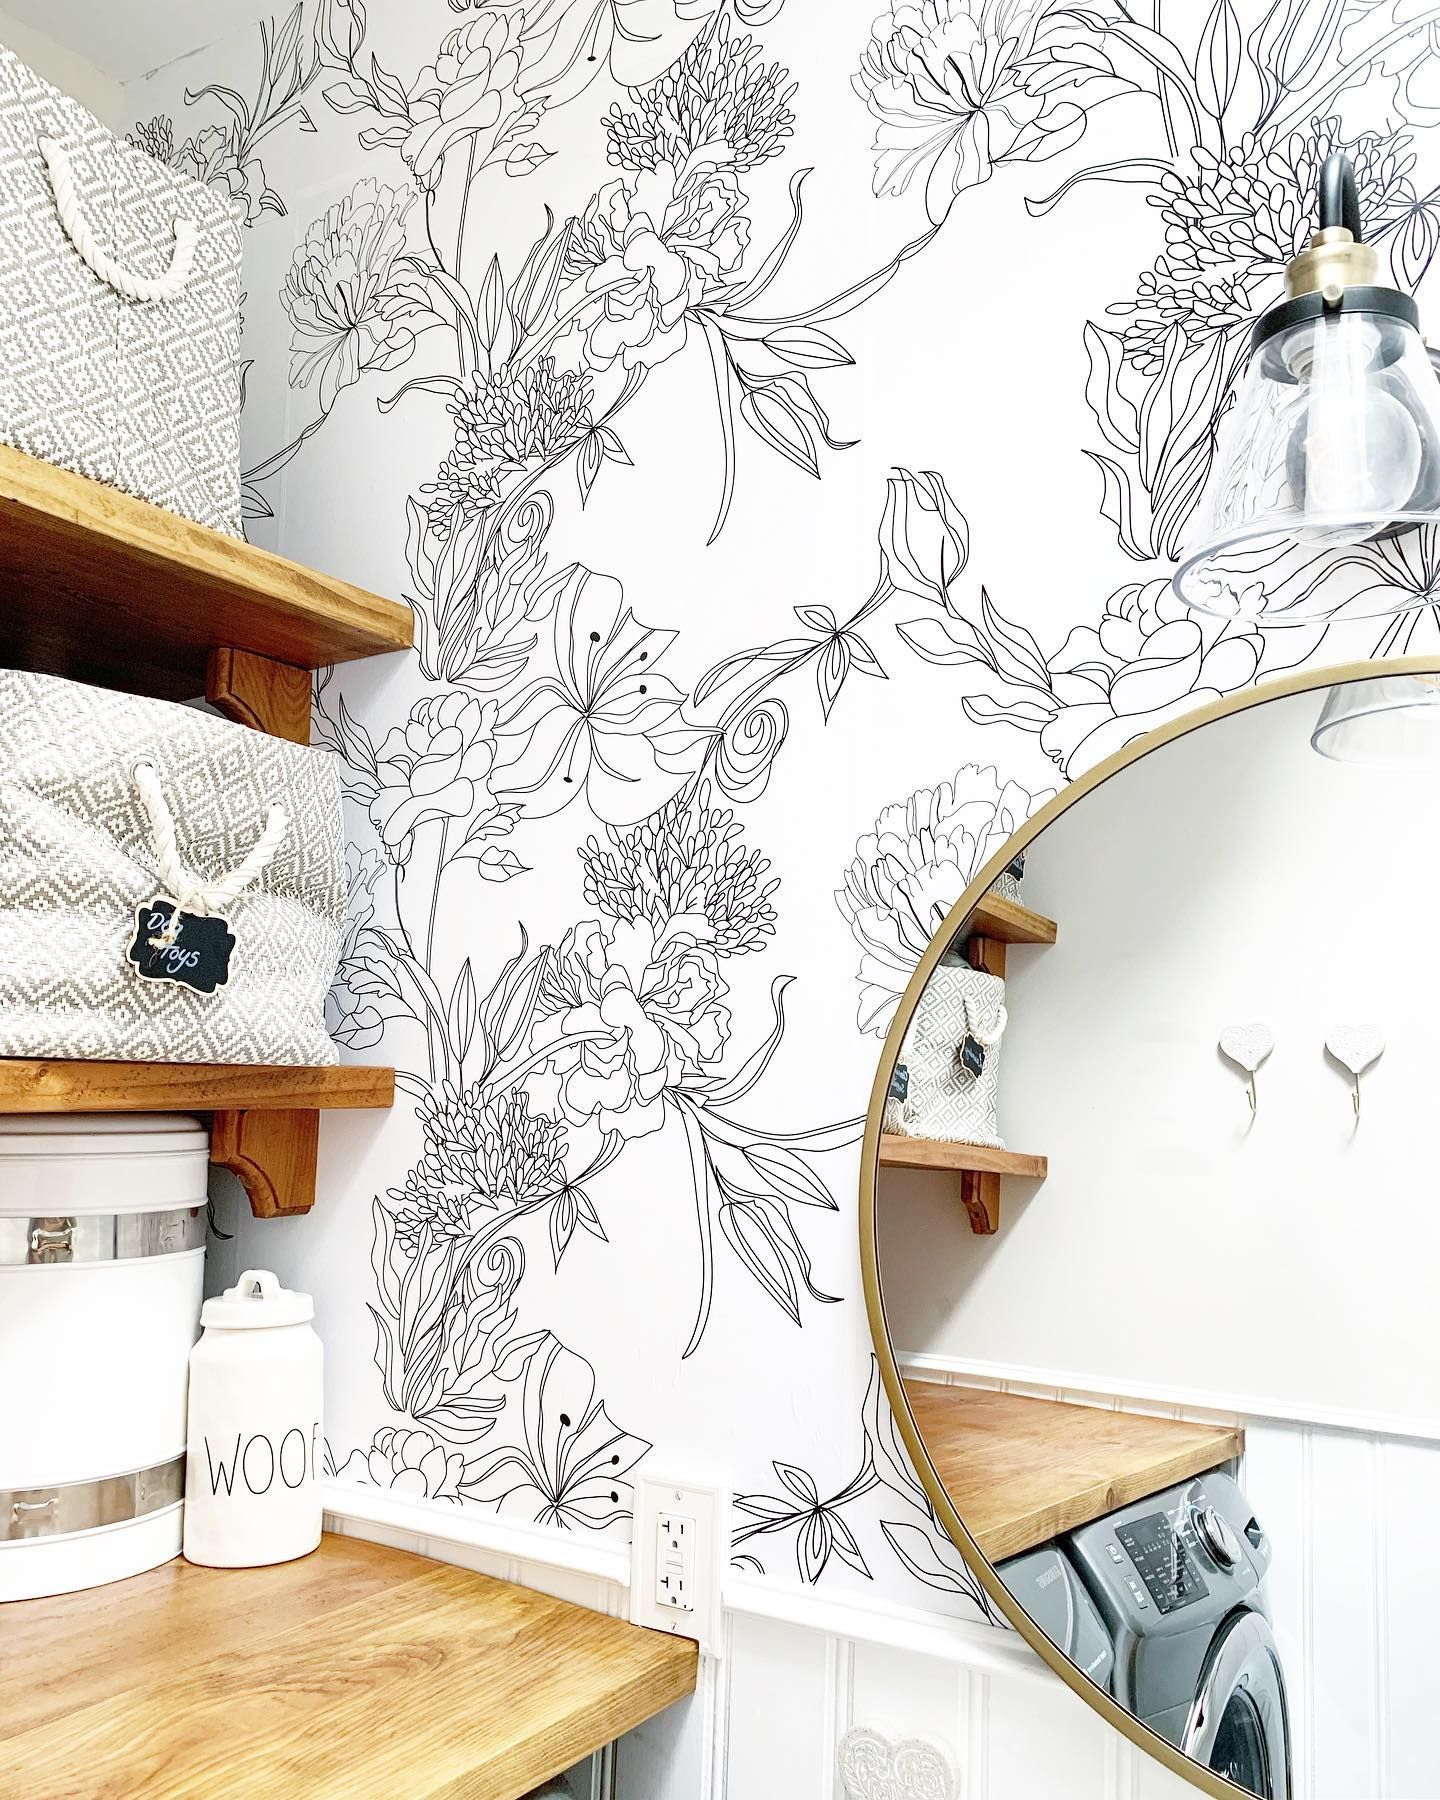 We Installed New Wallpaper Today Wallsneedlove Peel Stick Wallpaper Is Pre Glued In Between The Feature Wallpaper Wall Wallpaper White Pattern Wallpaper